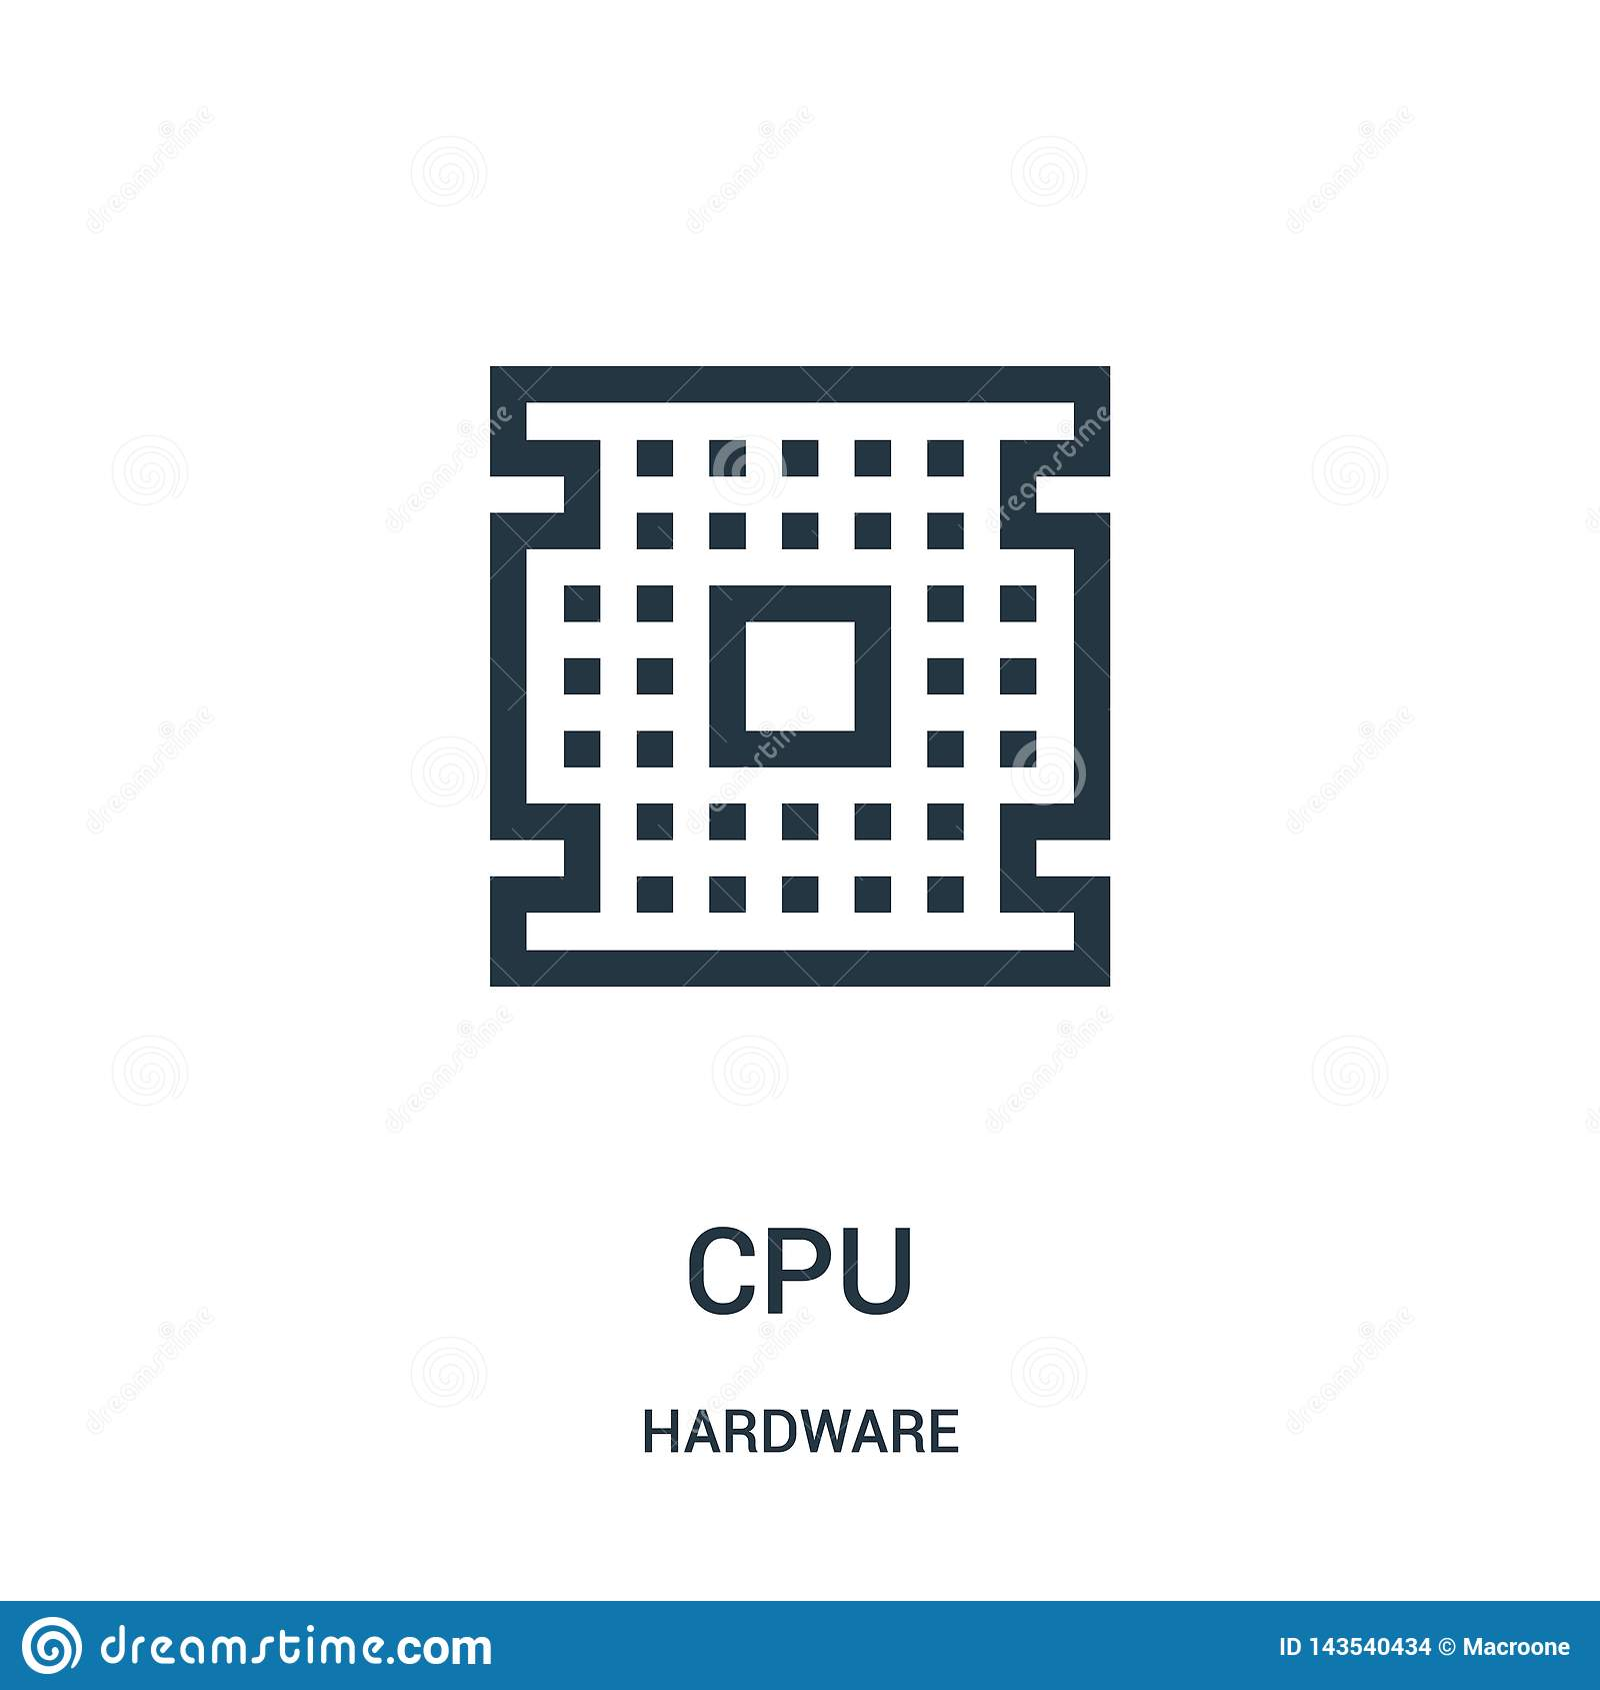 Vector del icono de la CPU de la colecci?n del hardware L?nea fina ejemplo del vector del icono del esquema de la CPU